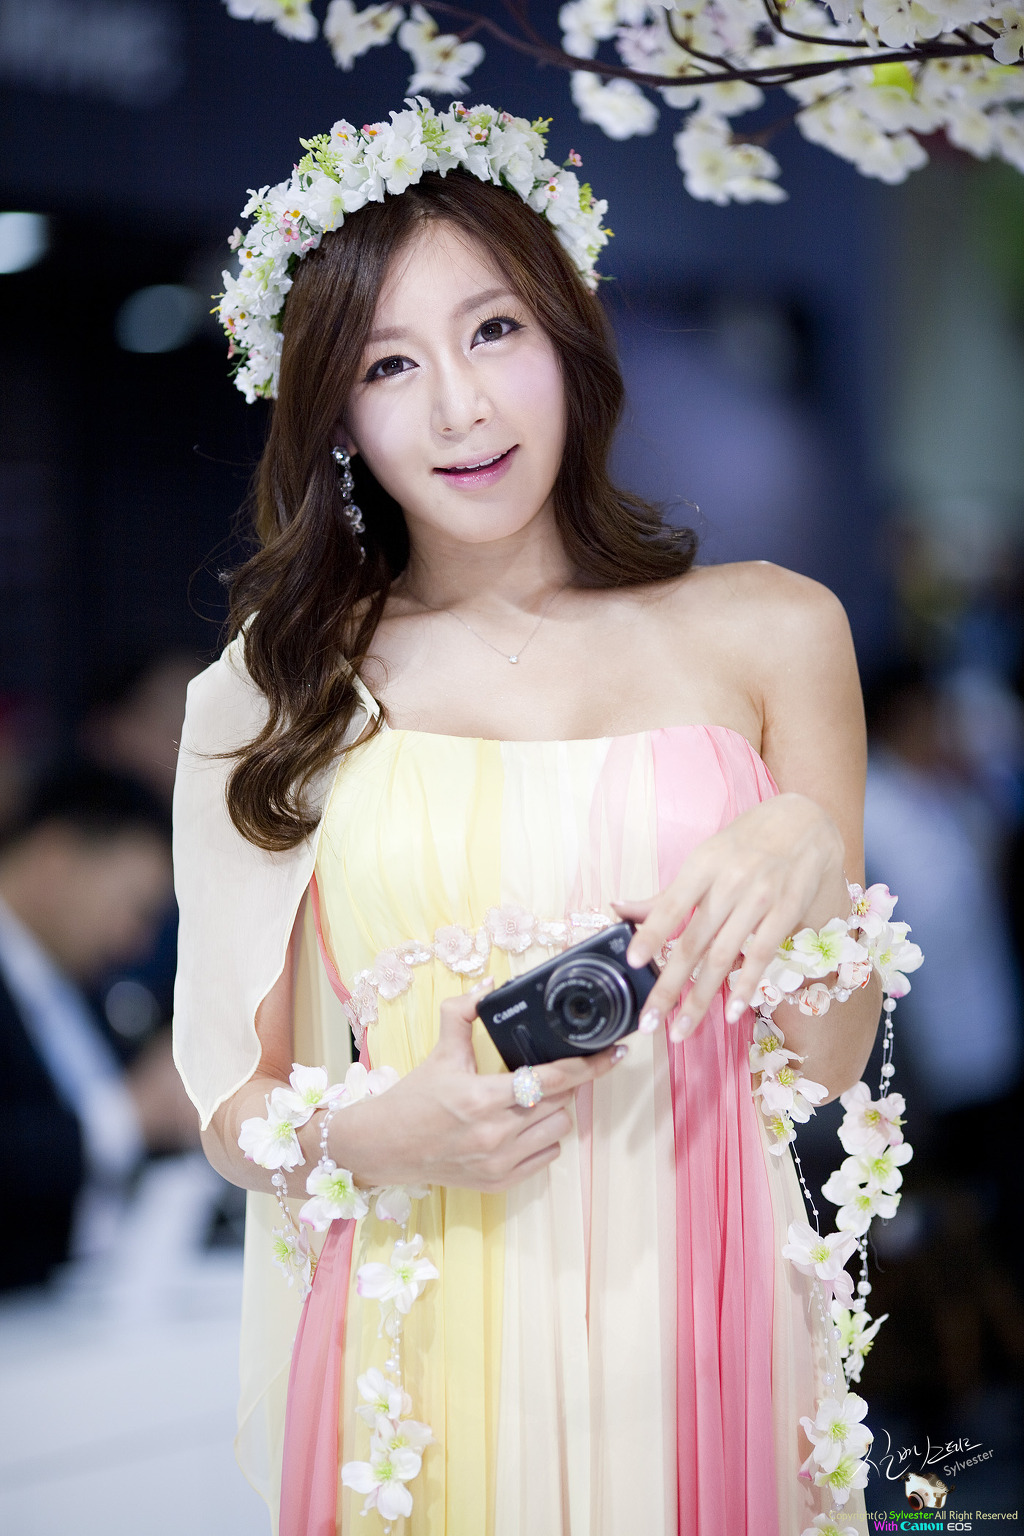 xxx nude girls: Jang Yoo Seul - CJ SuperRace 2012 R1